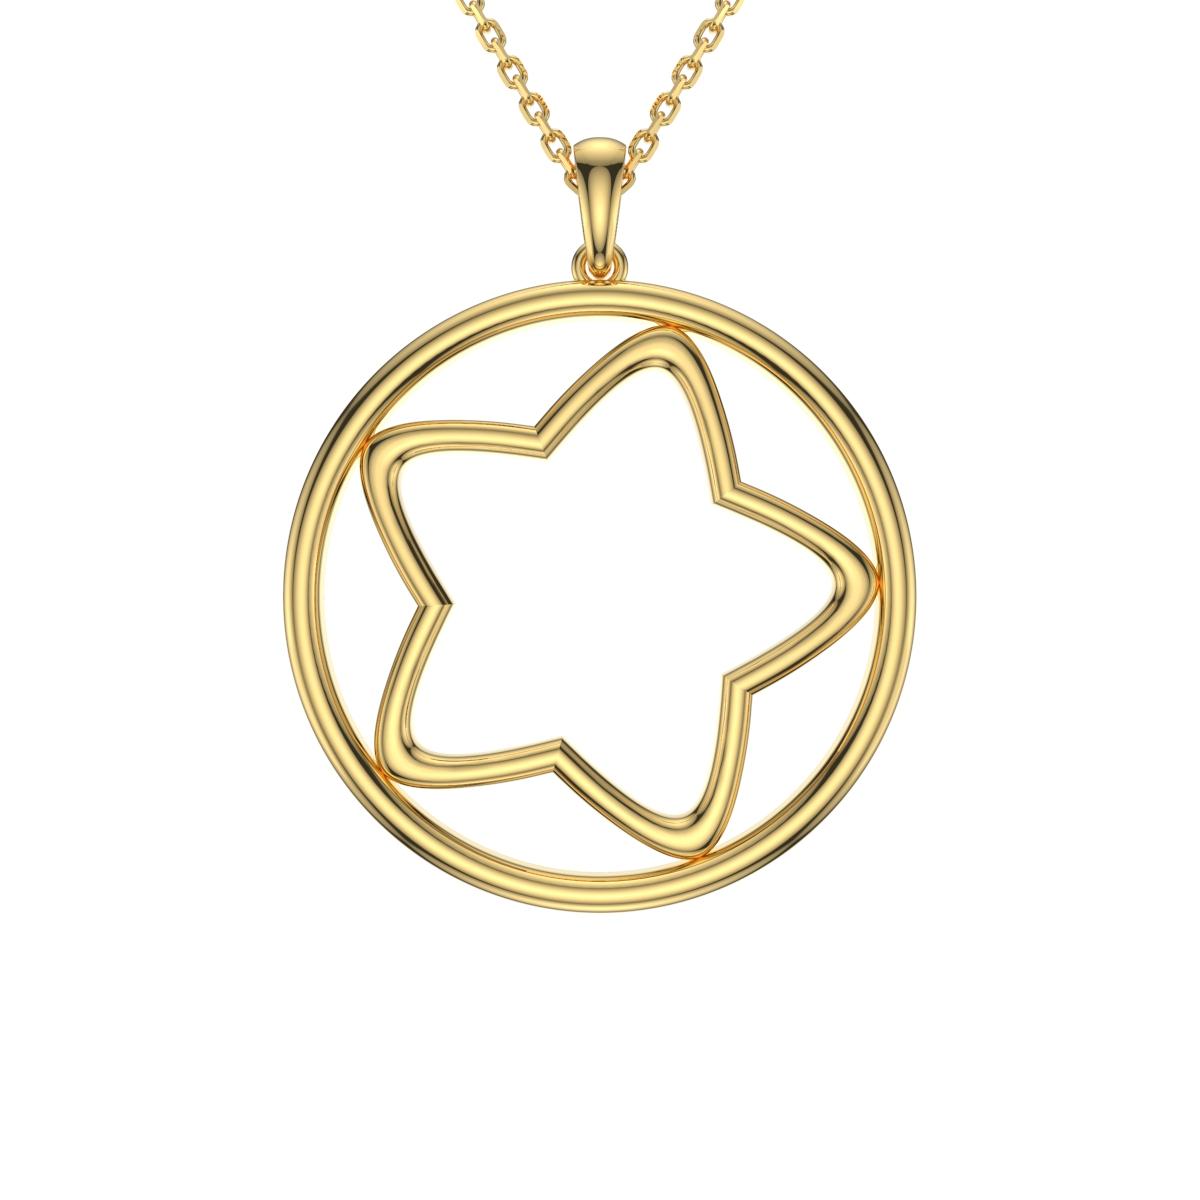 星星圆牌项链